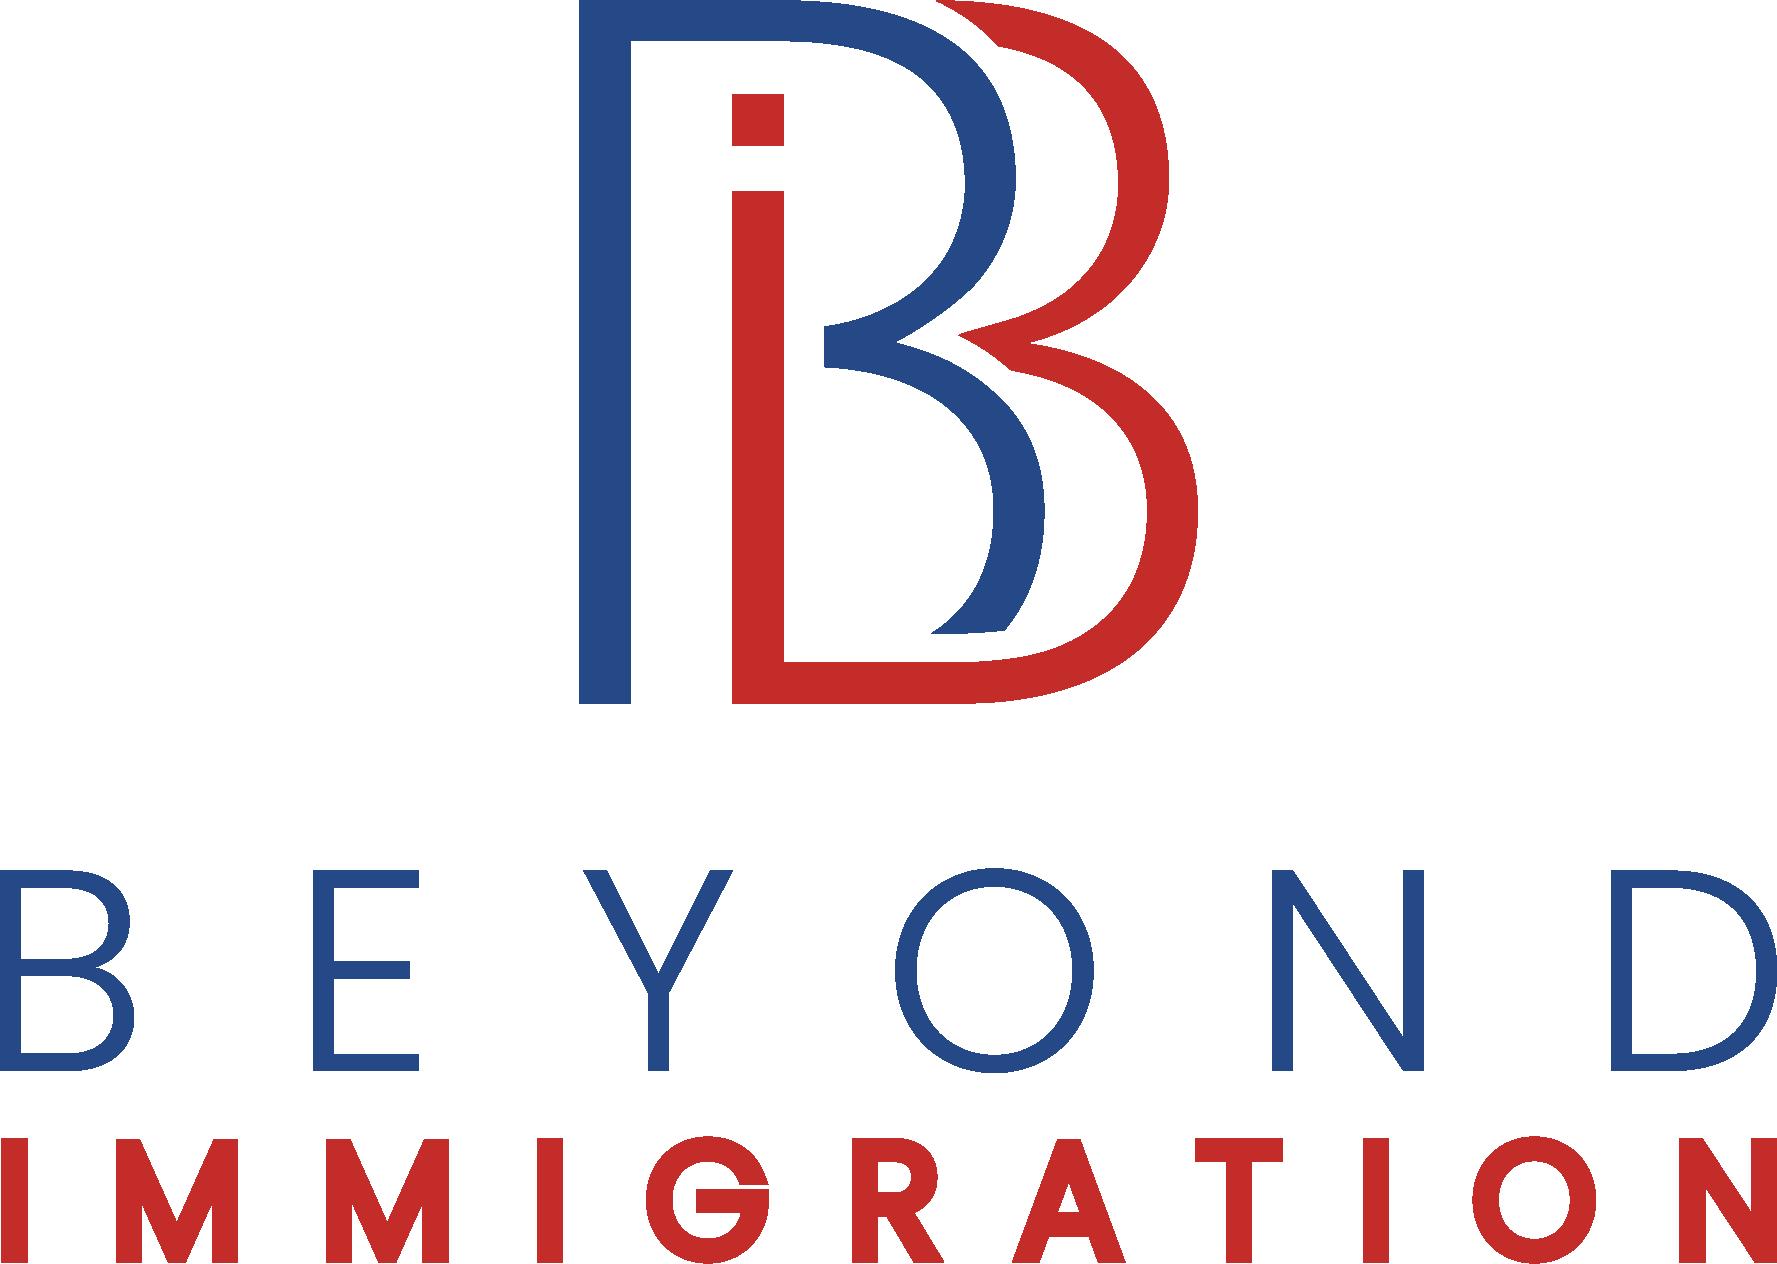 Beyond Immigration Pte Ltd